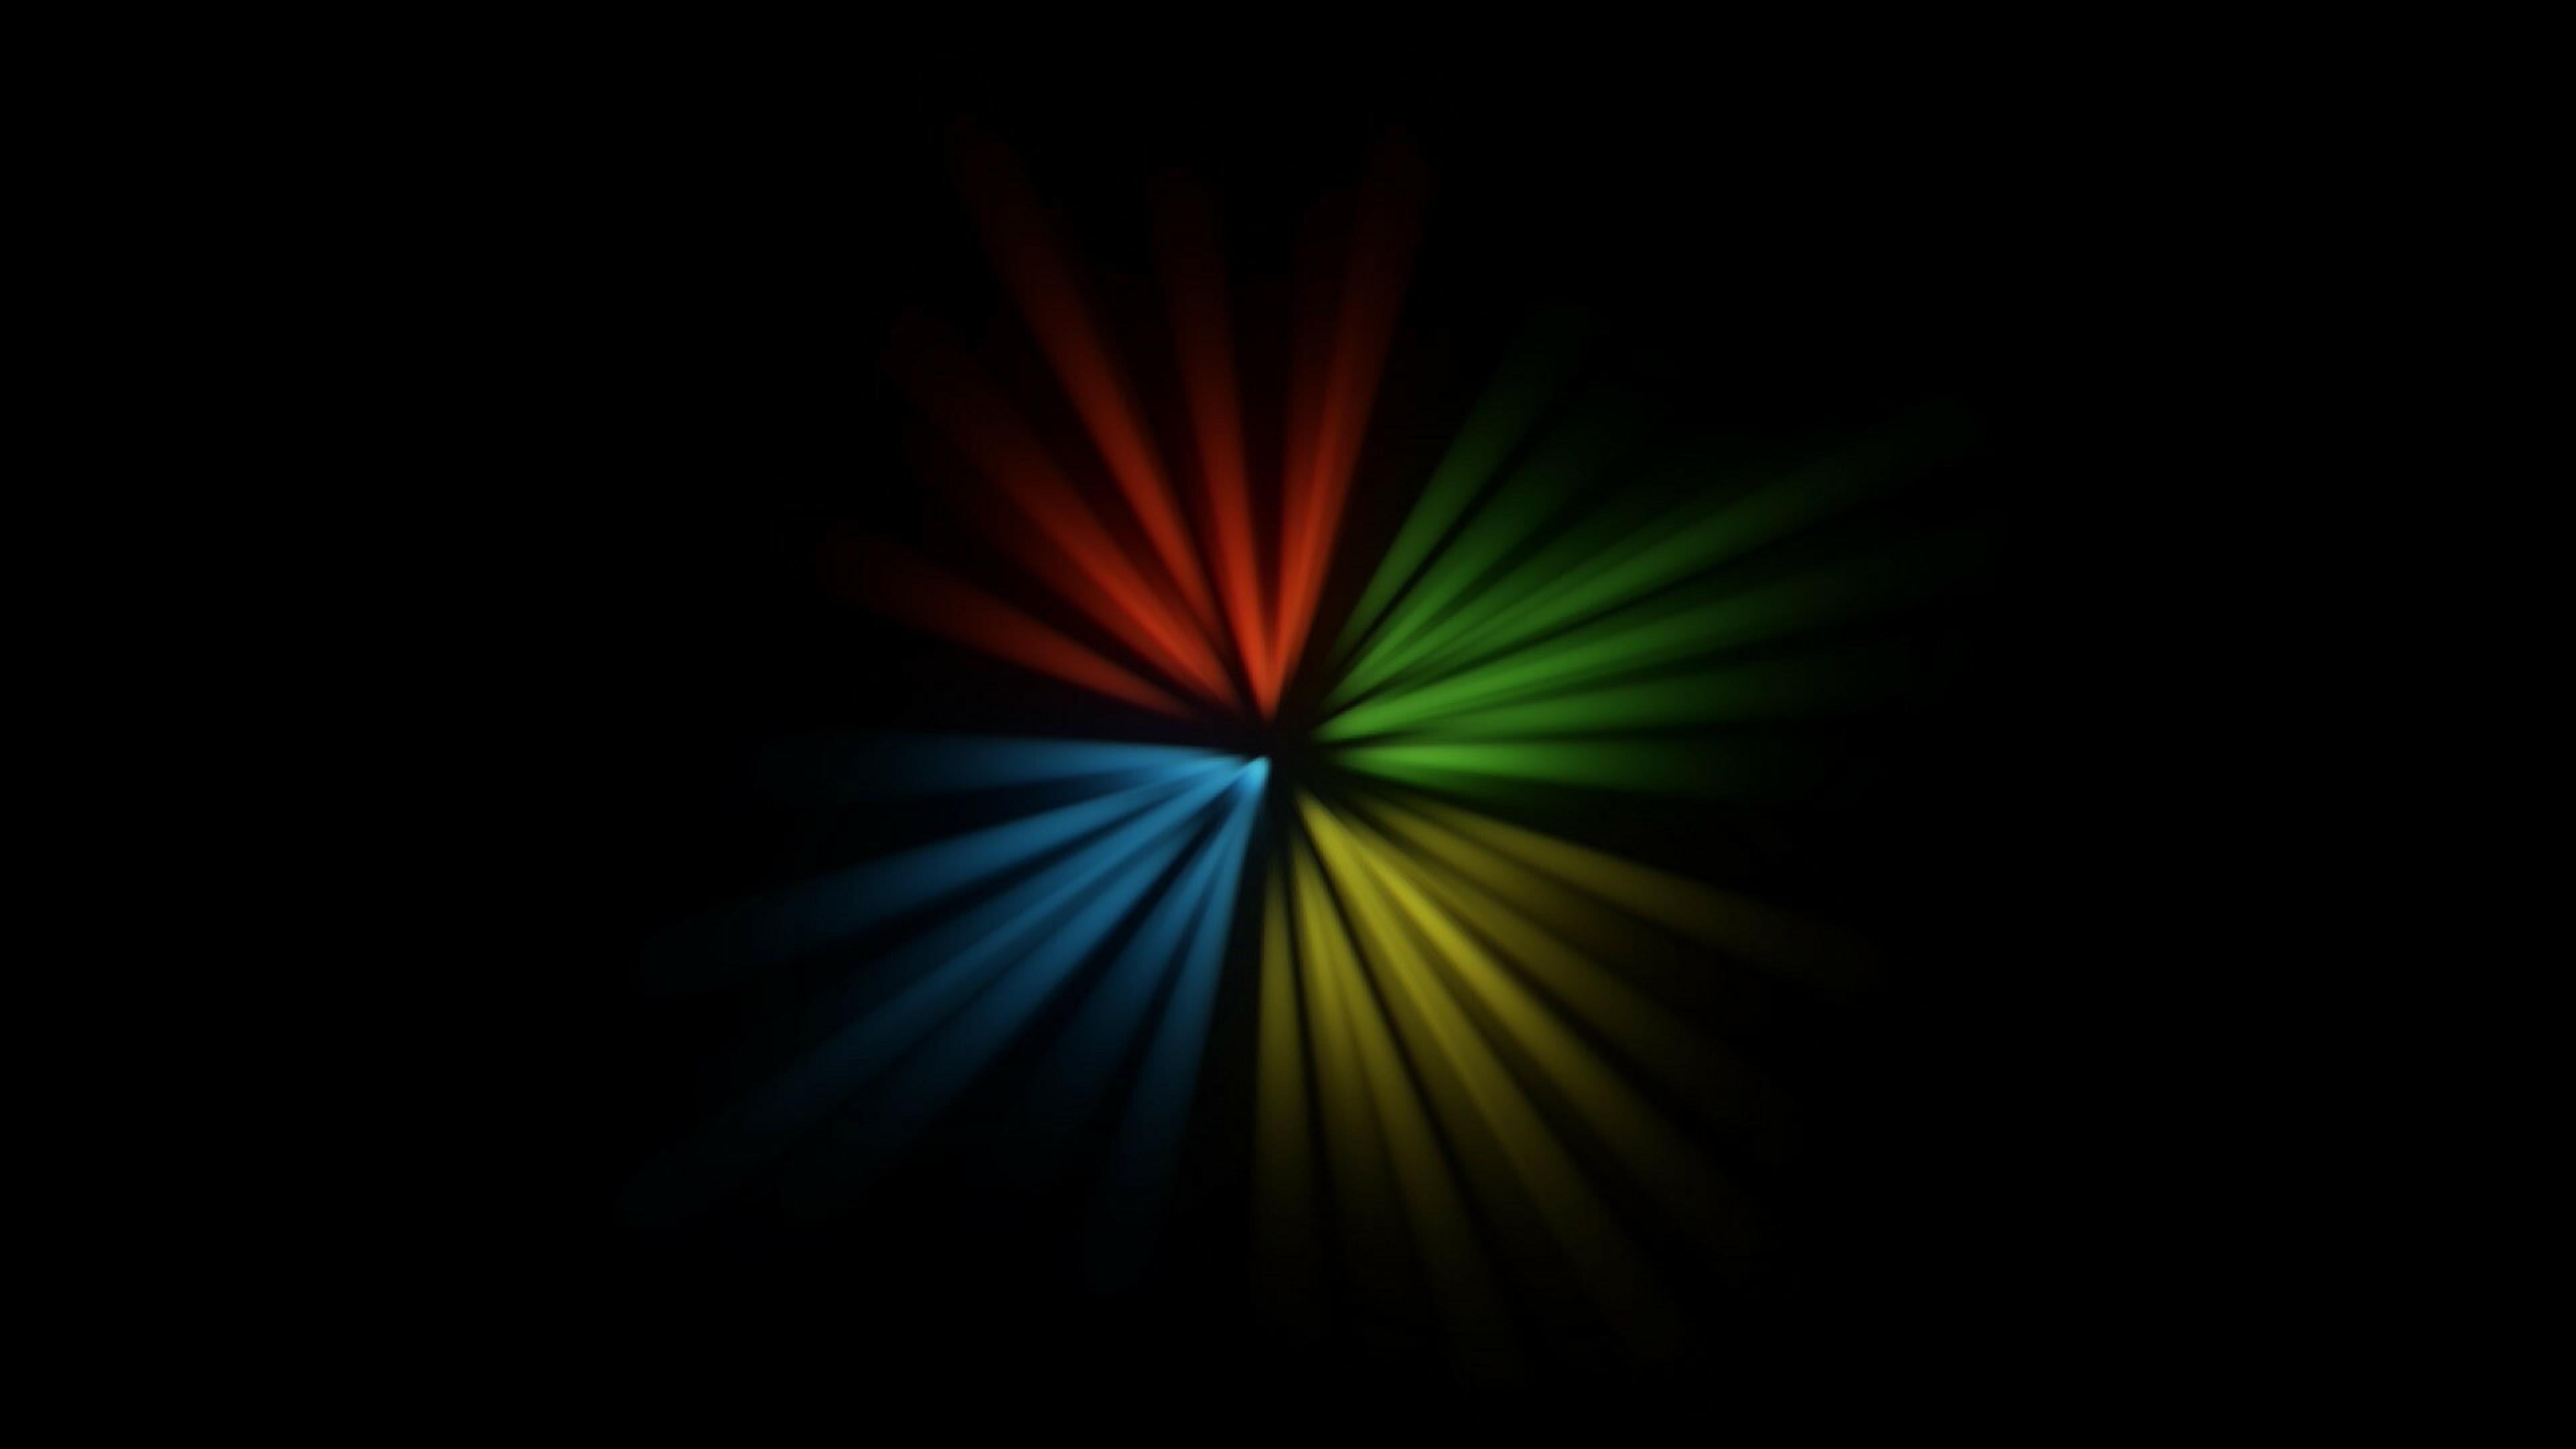 Wallpaper 3840x2160 windows yellow black blue green red 4K 3840x2160